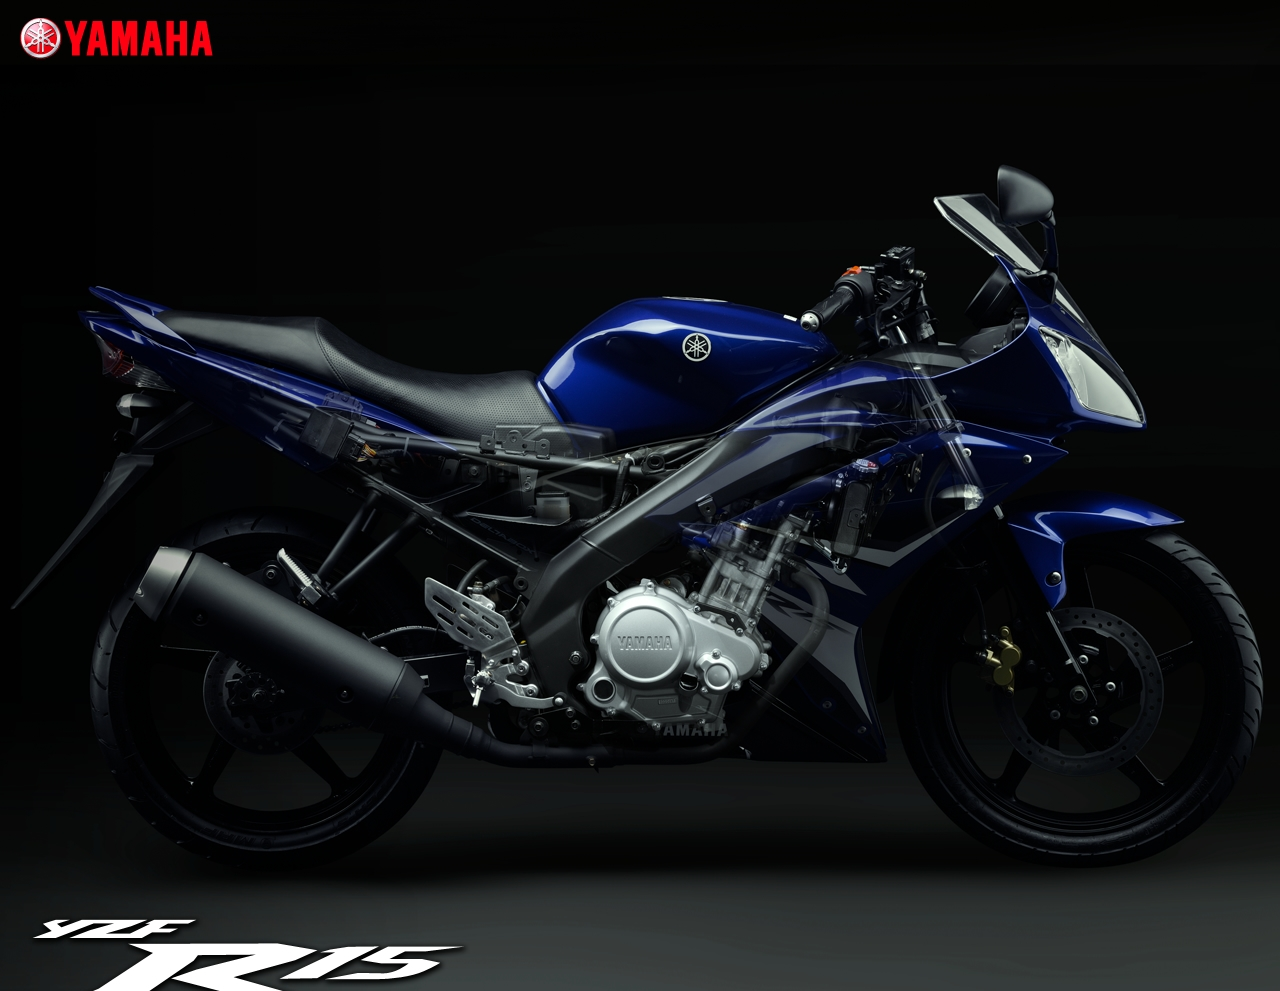 Yamaha Vixion Specification